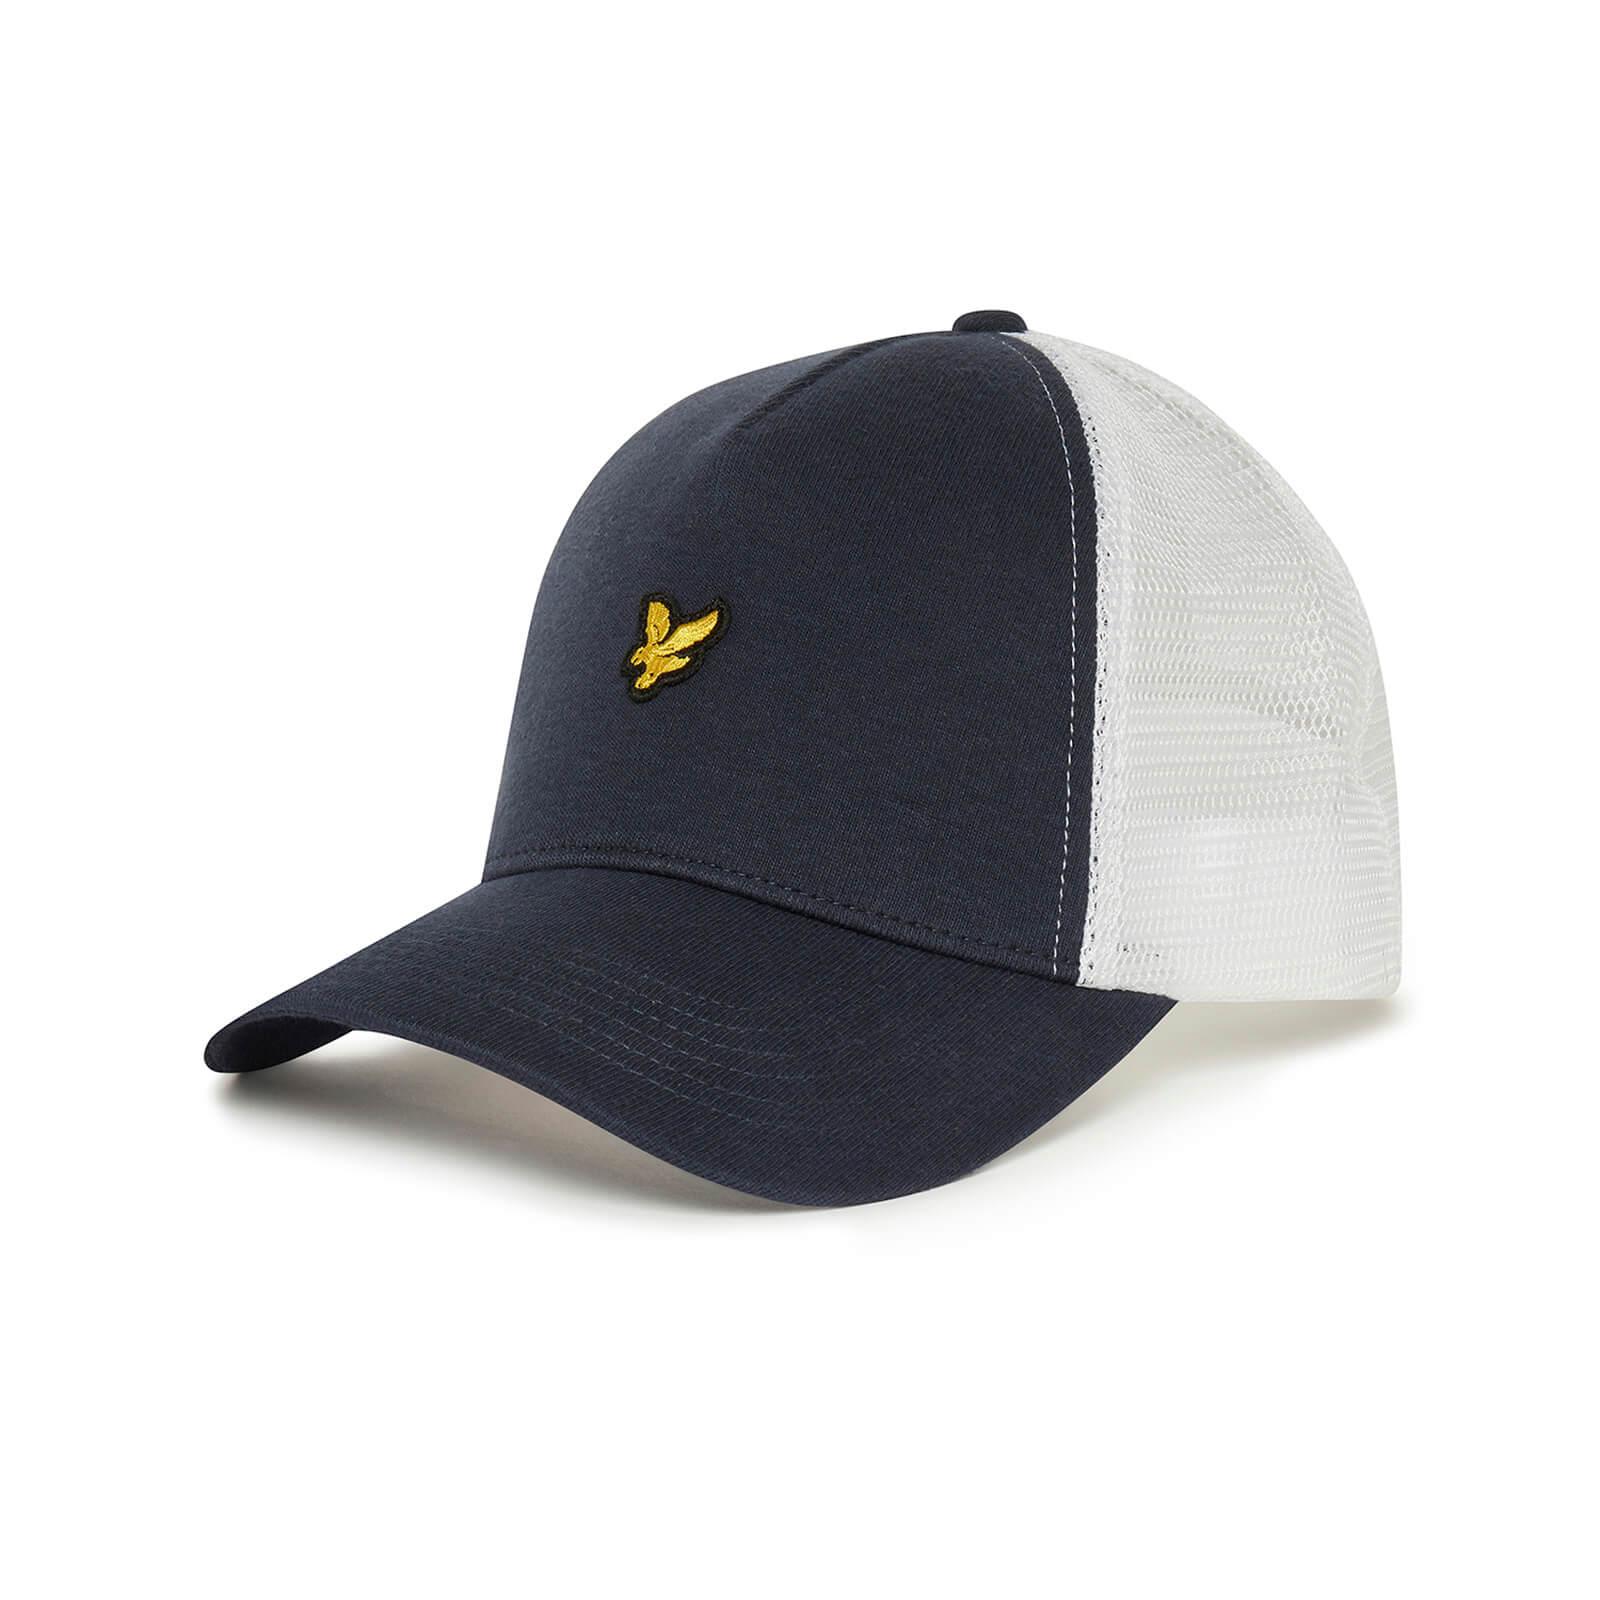 Trucker Cap - Dark Navy/White Mesh - One Size